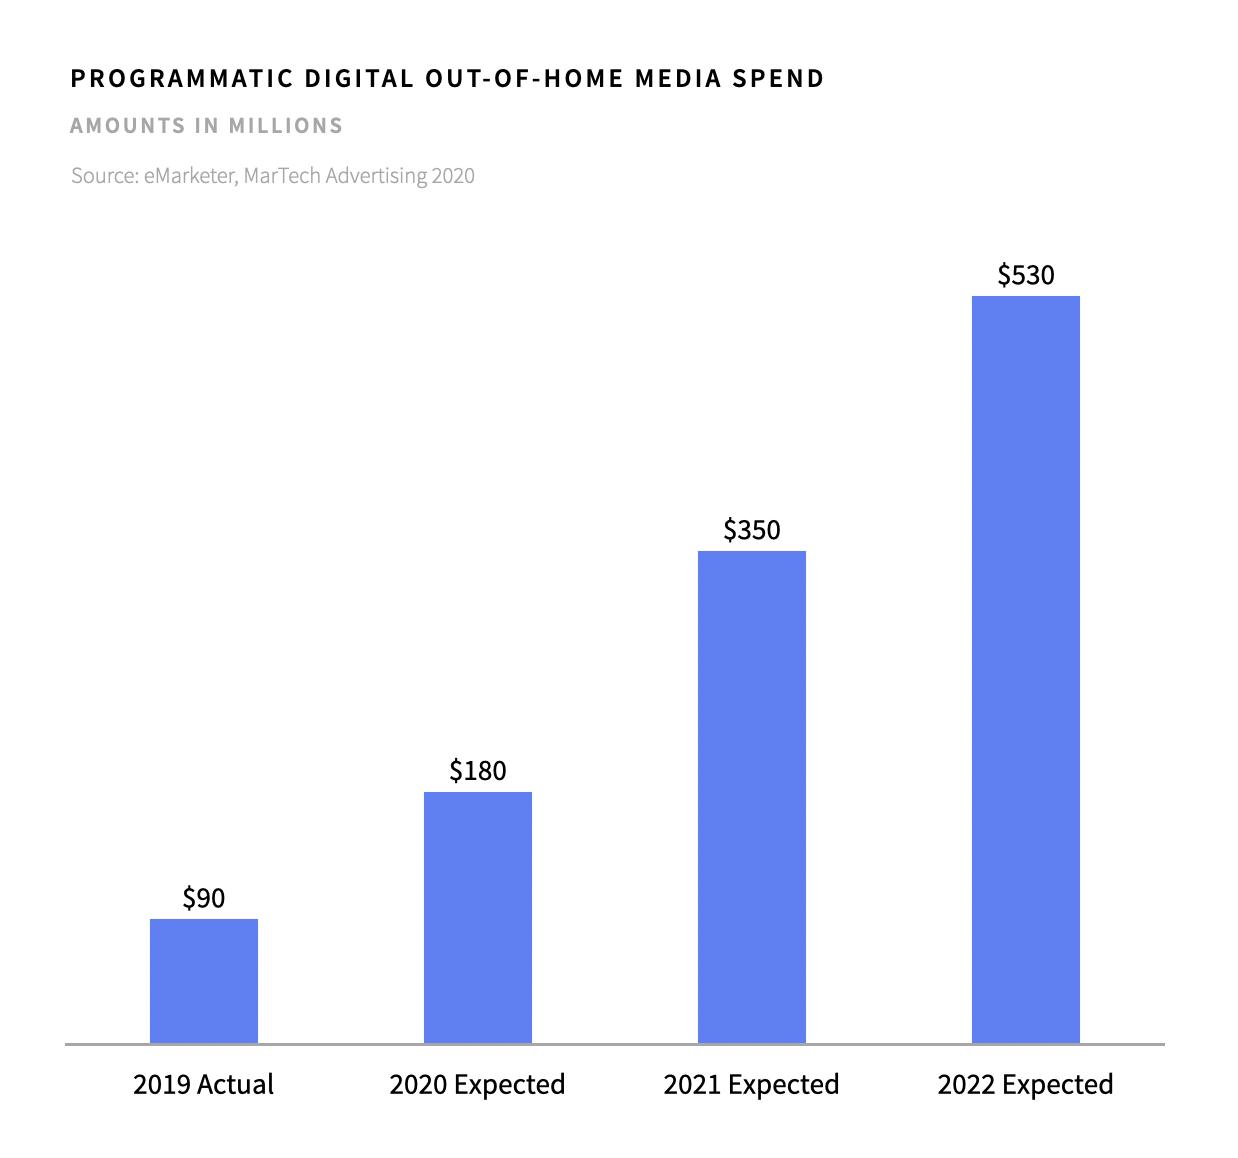 Programmatic DOOH Spend